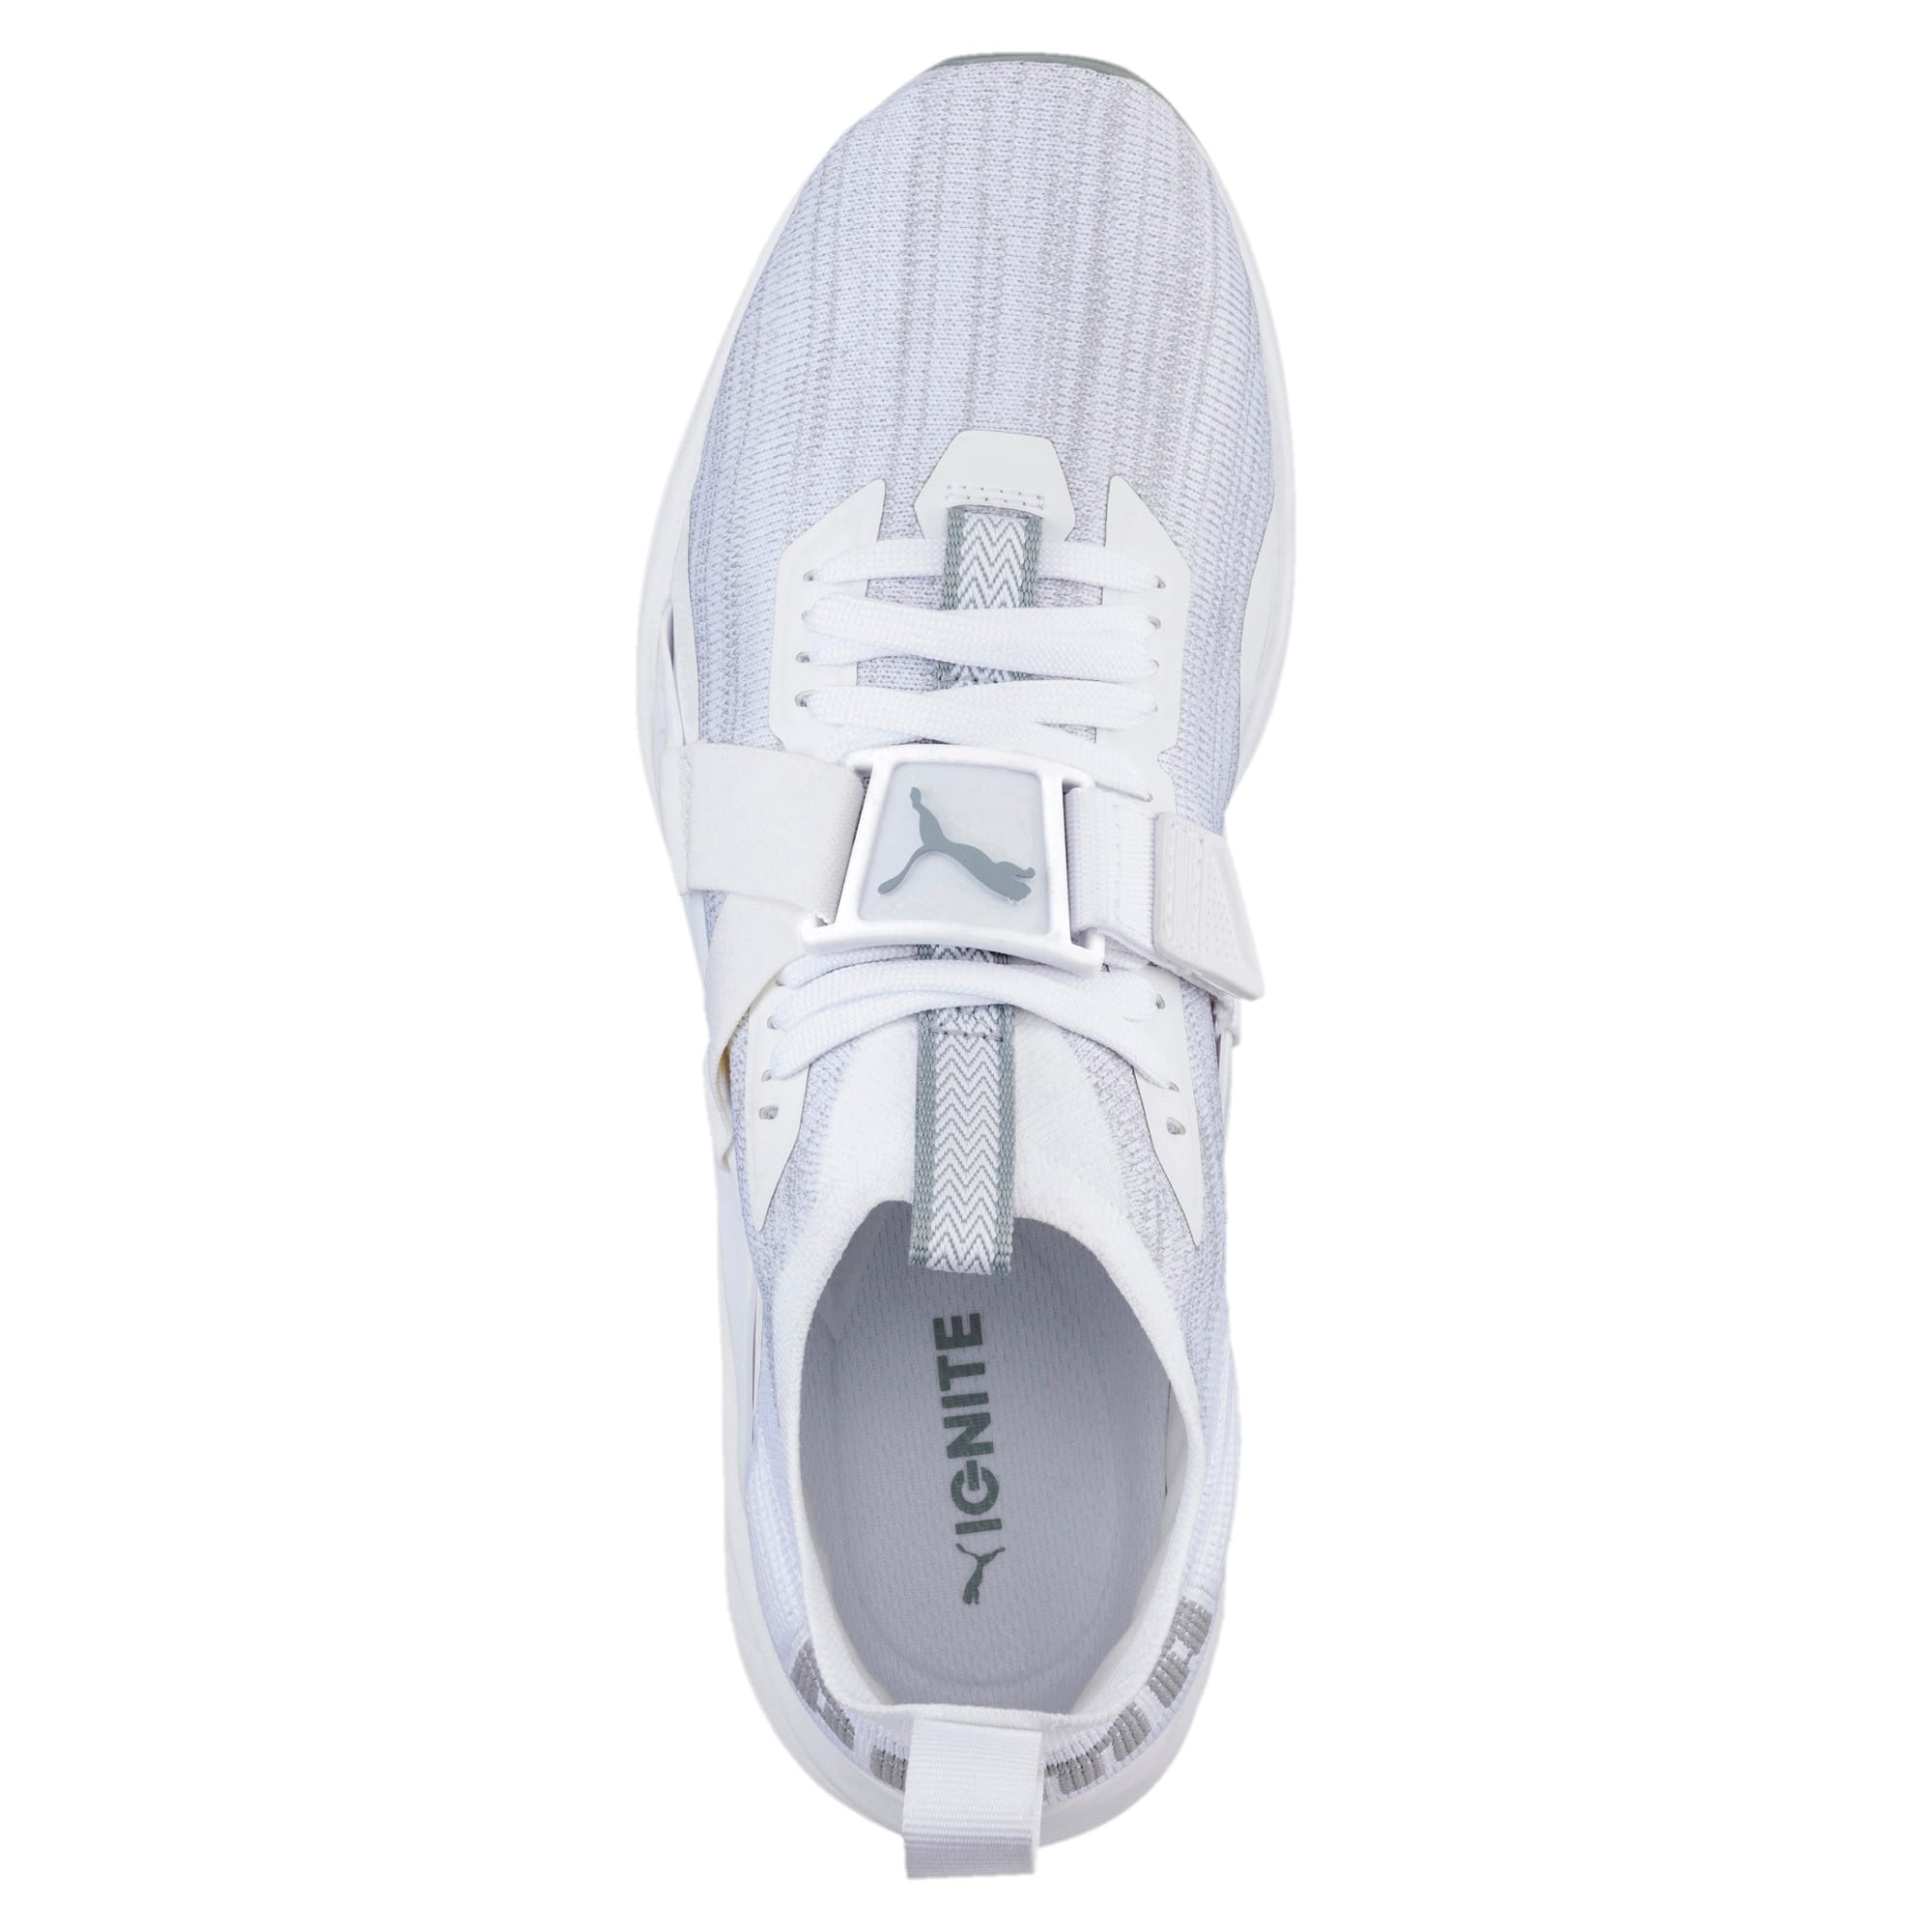 timeless design c33ba 8593c IGNITE evoKNIT 2 Lo Men's Running Shoes